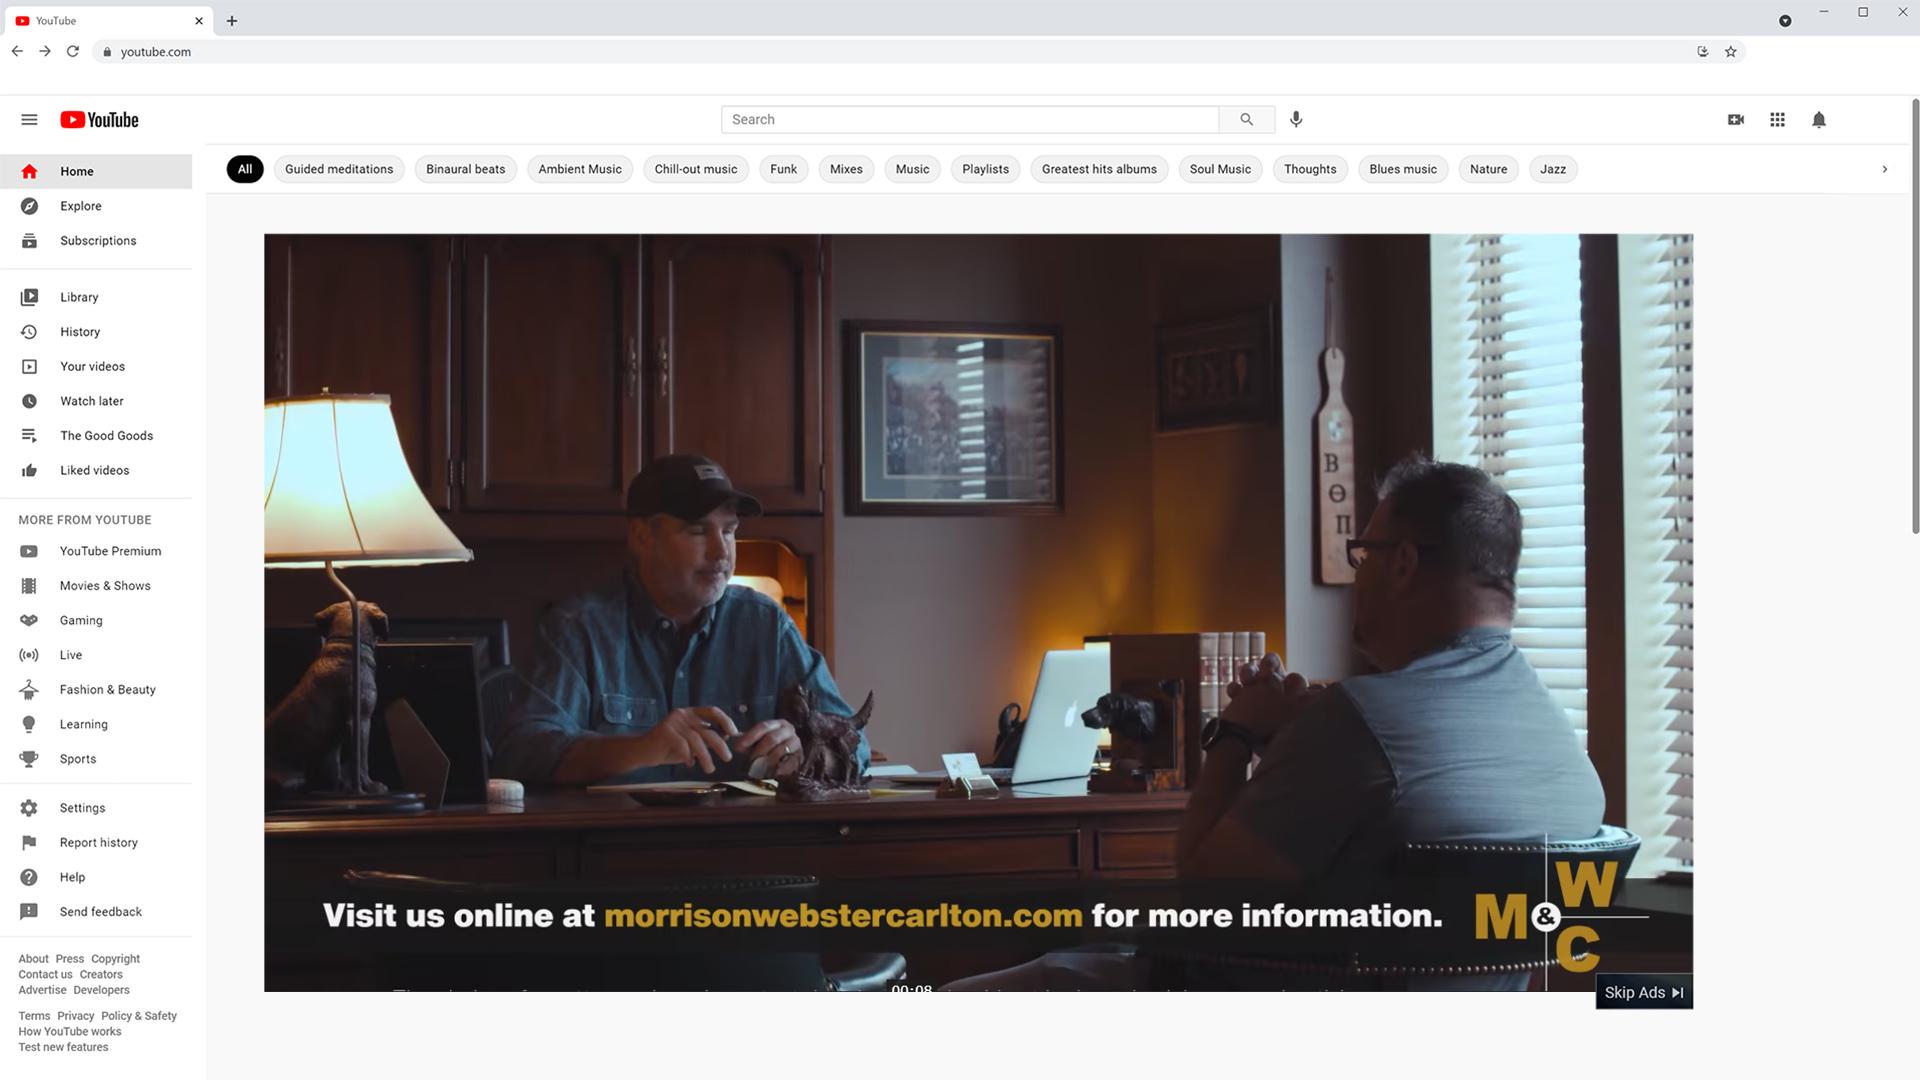 Morrison Webster Carlton YouTube Ad Digital Advertising